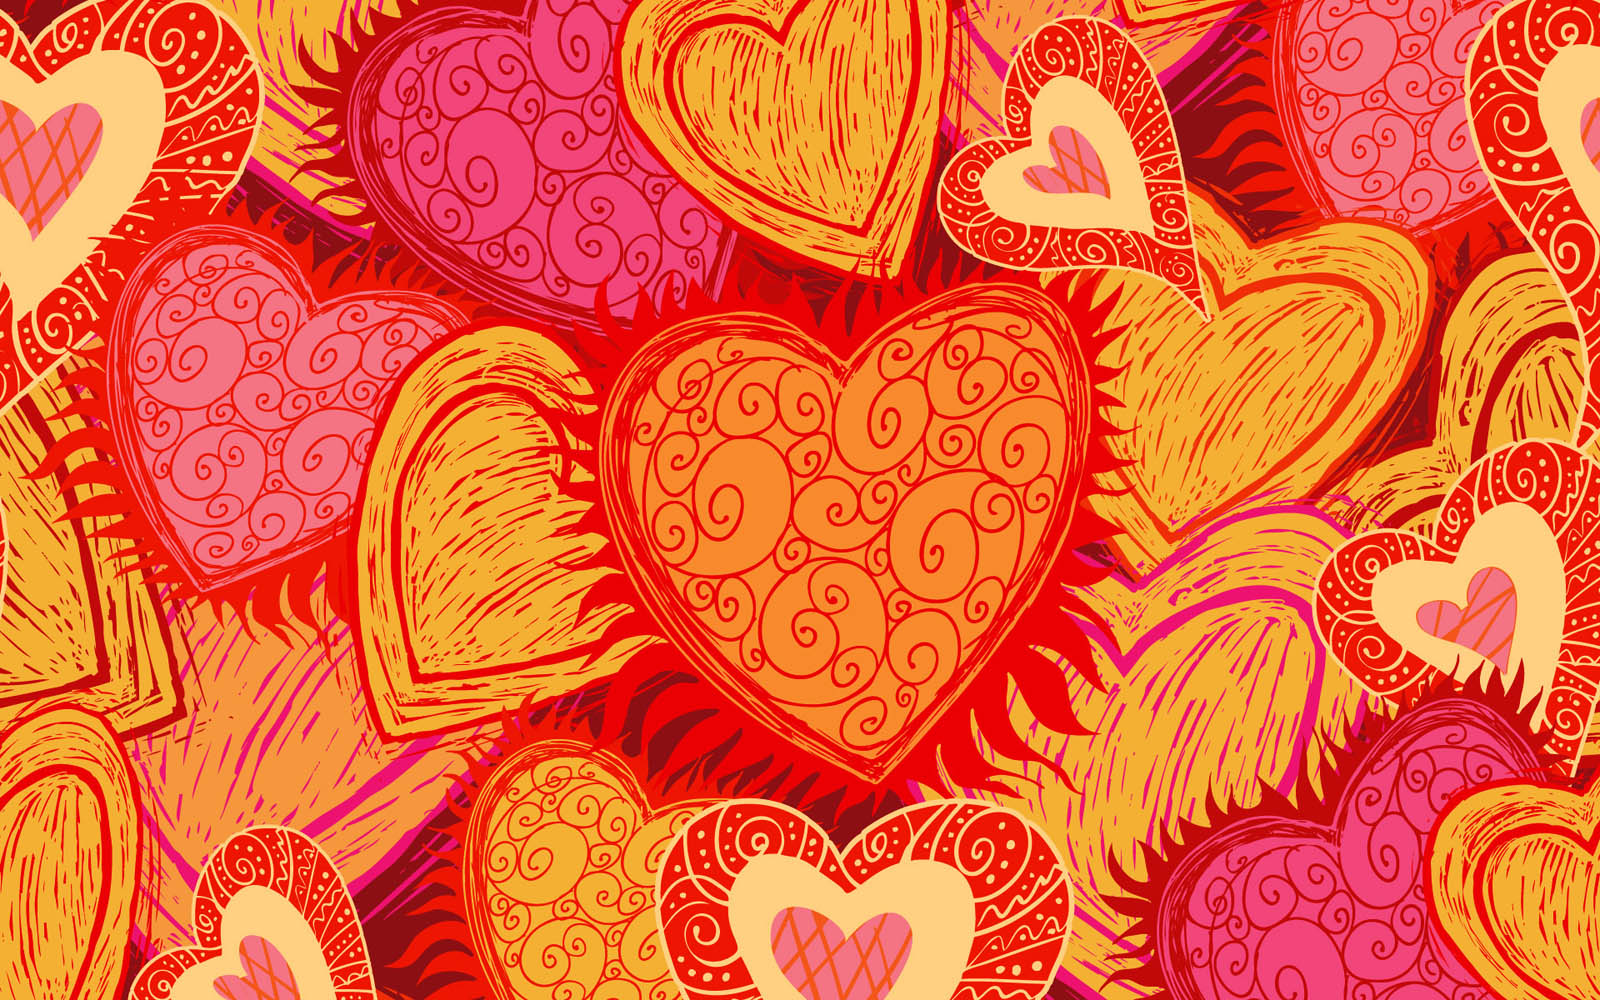 Heart Love Wallpapers ~ Desktop Wallpaper